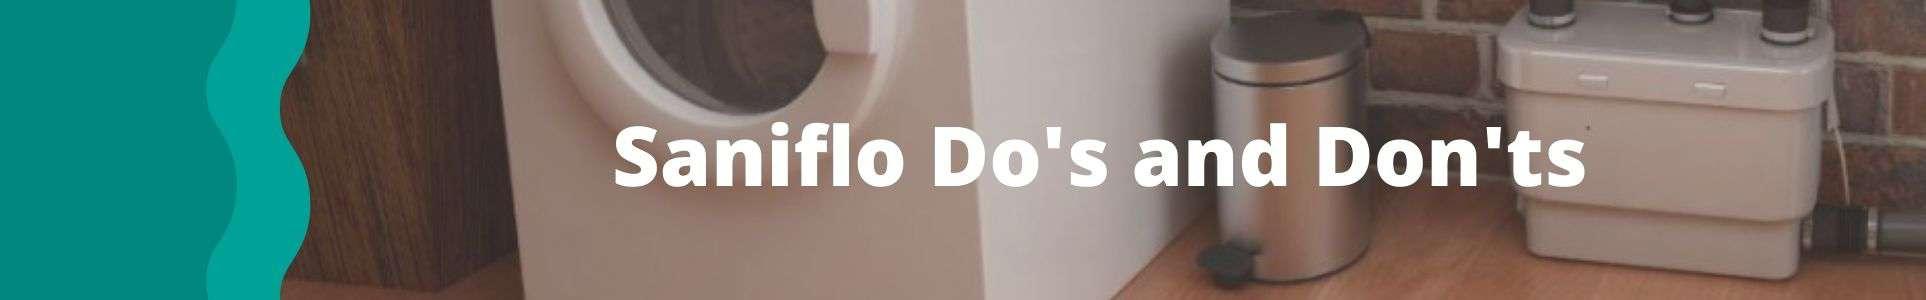 saniflo do's and don'ts